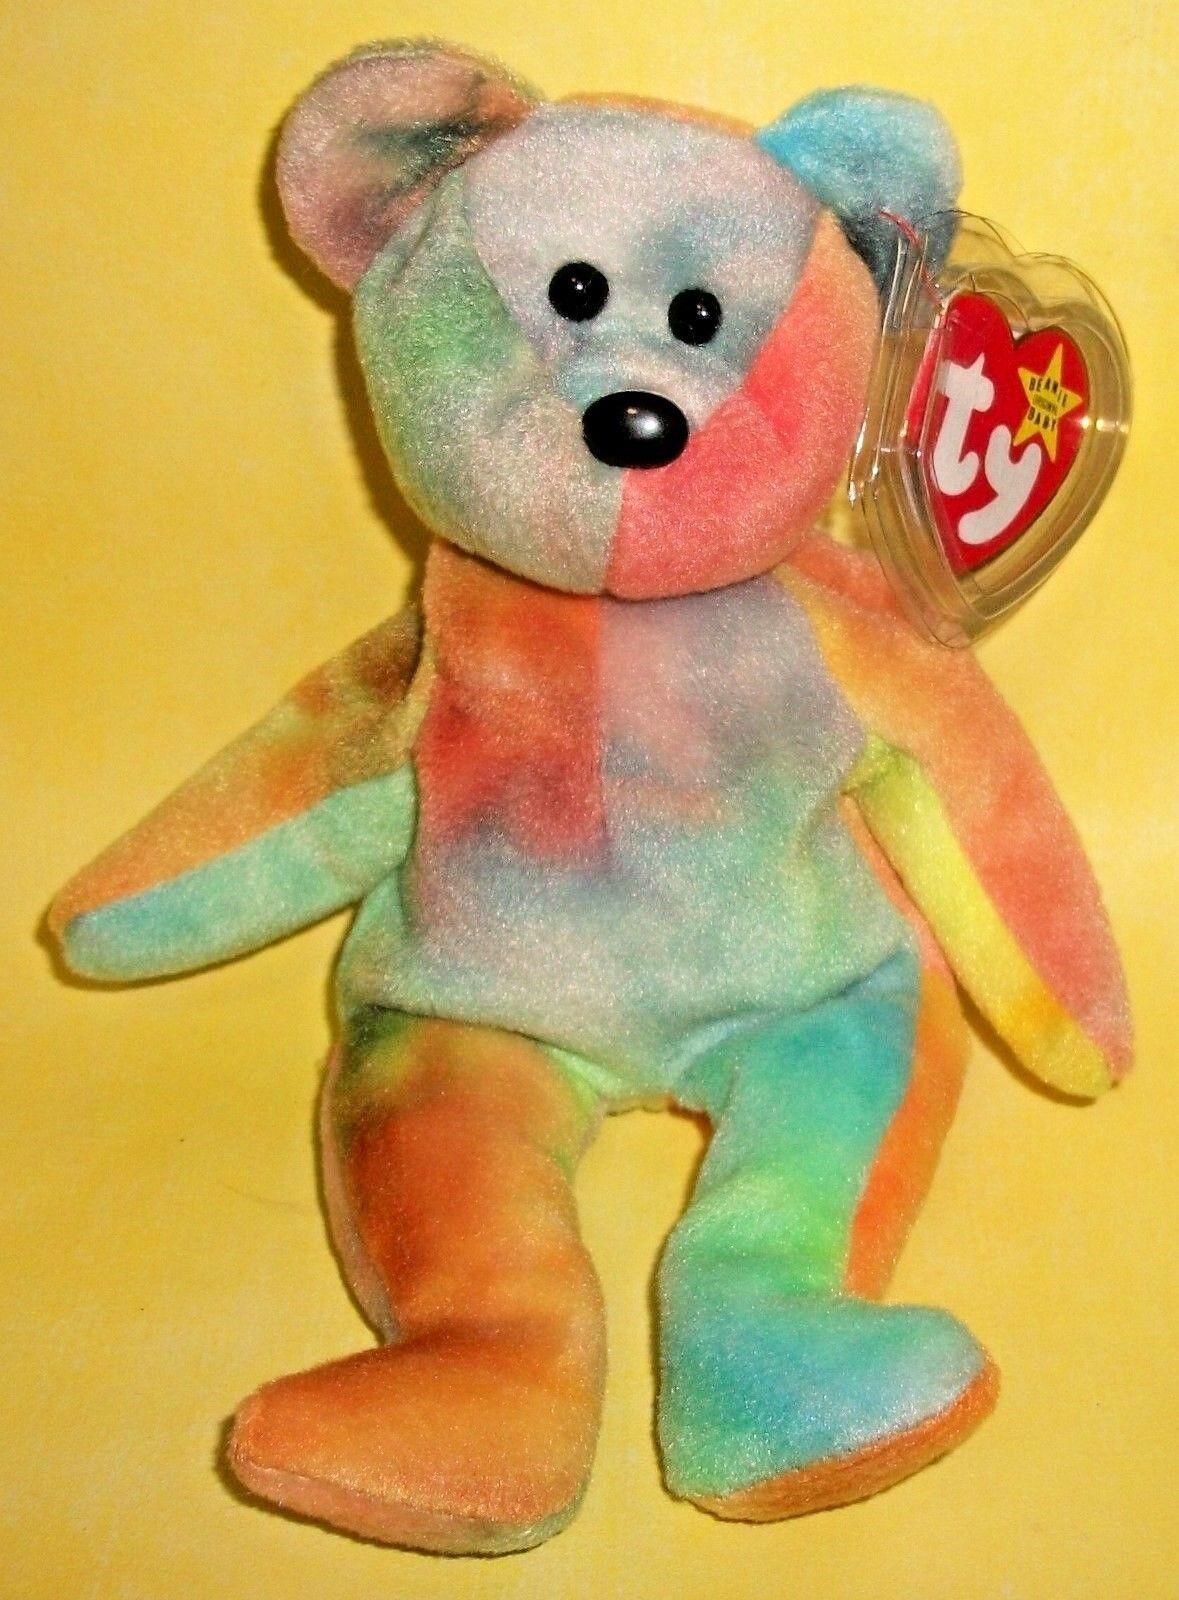 TY Beanie Baby GARCIA The Bear PERFECT CHRISTMAS GIFT, MINT  A+  RARE ERRORS